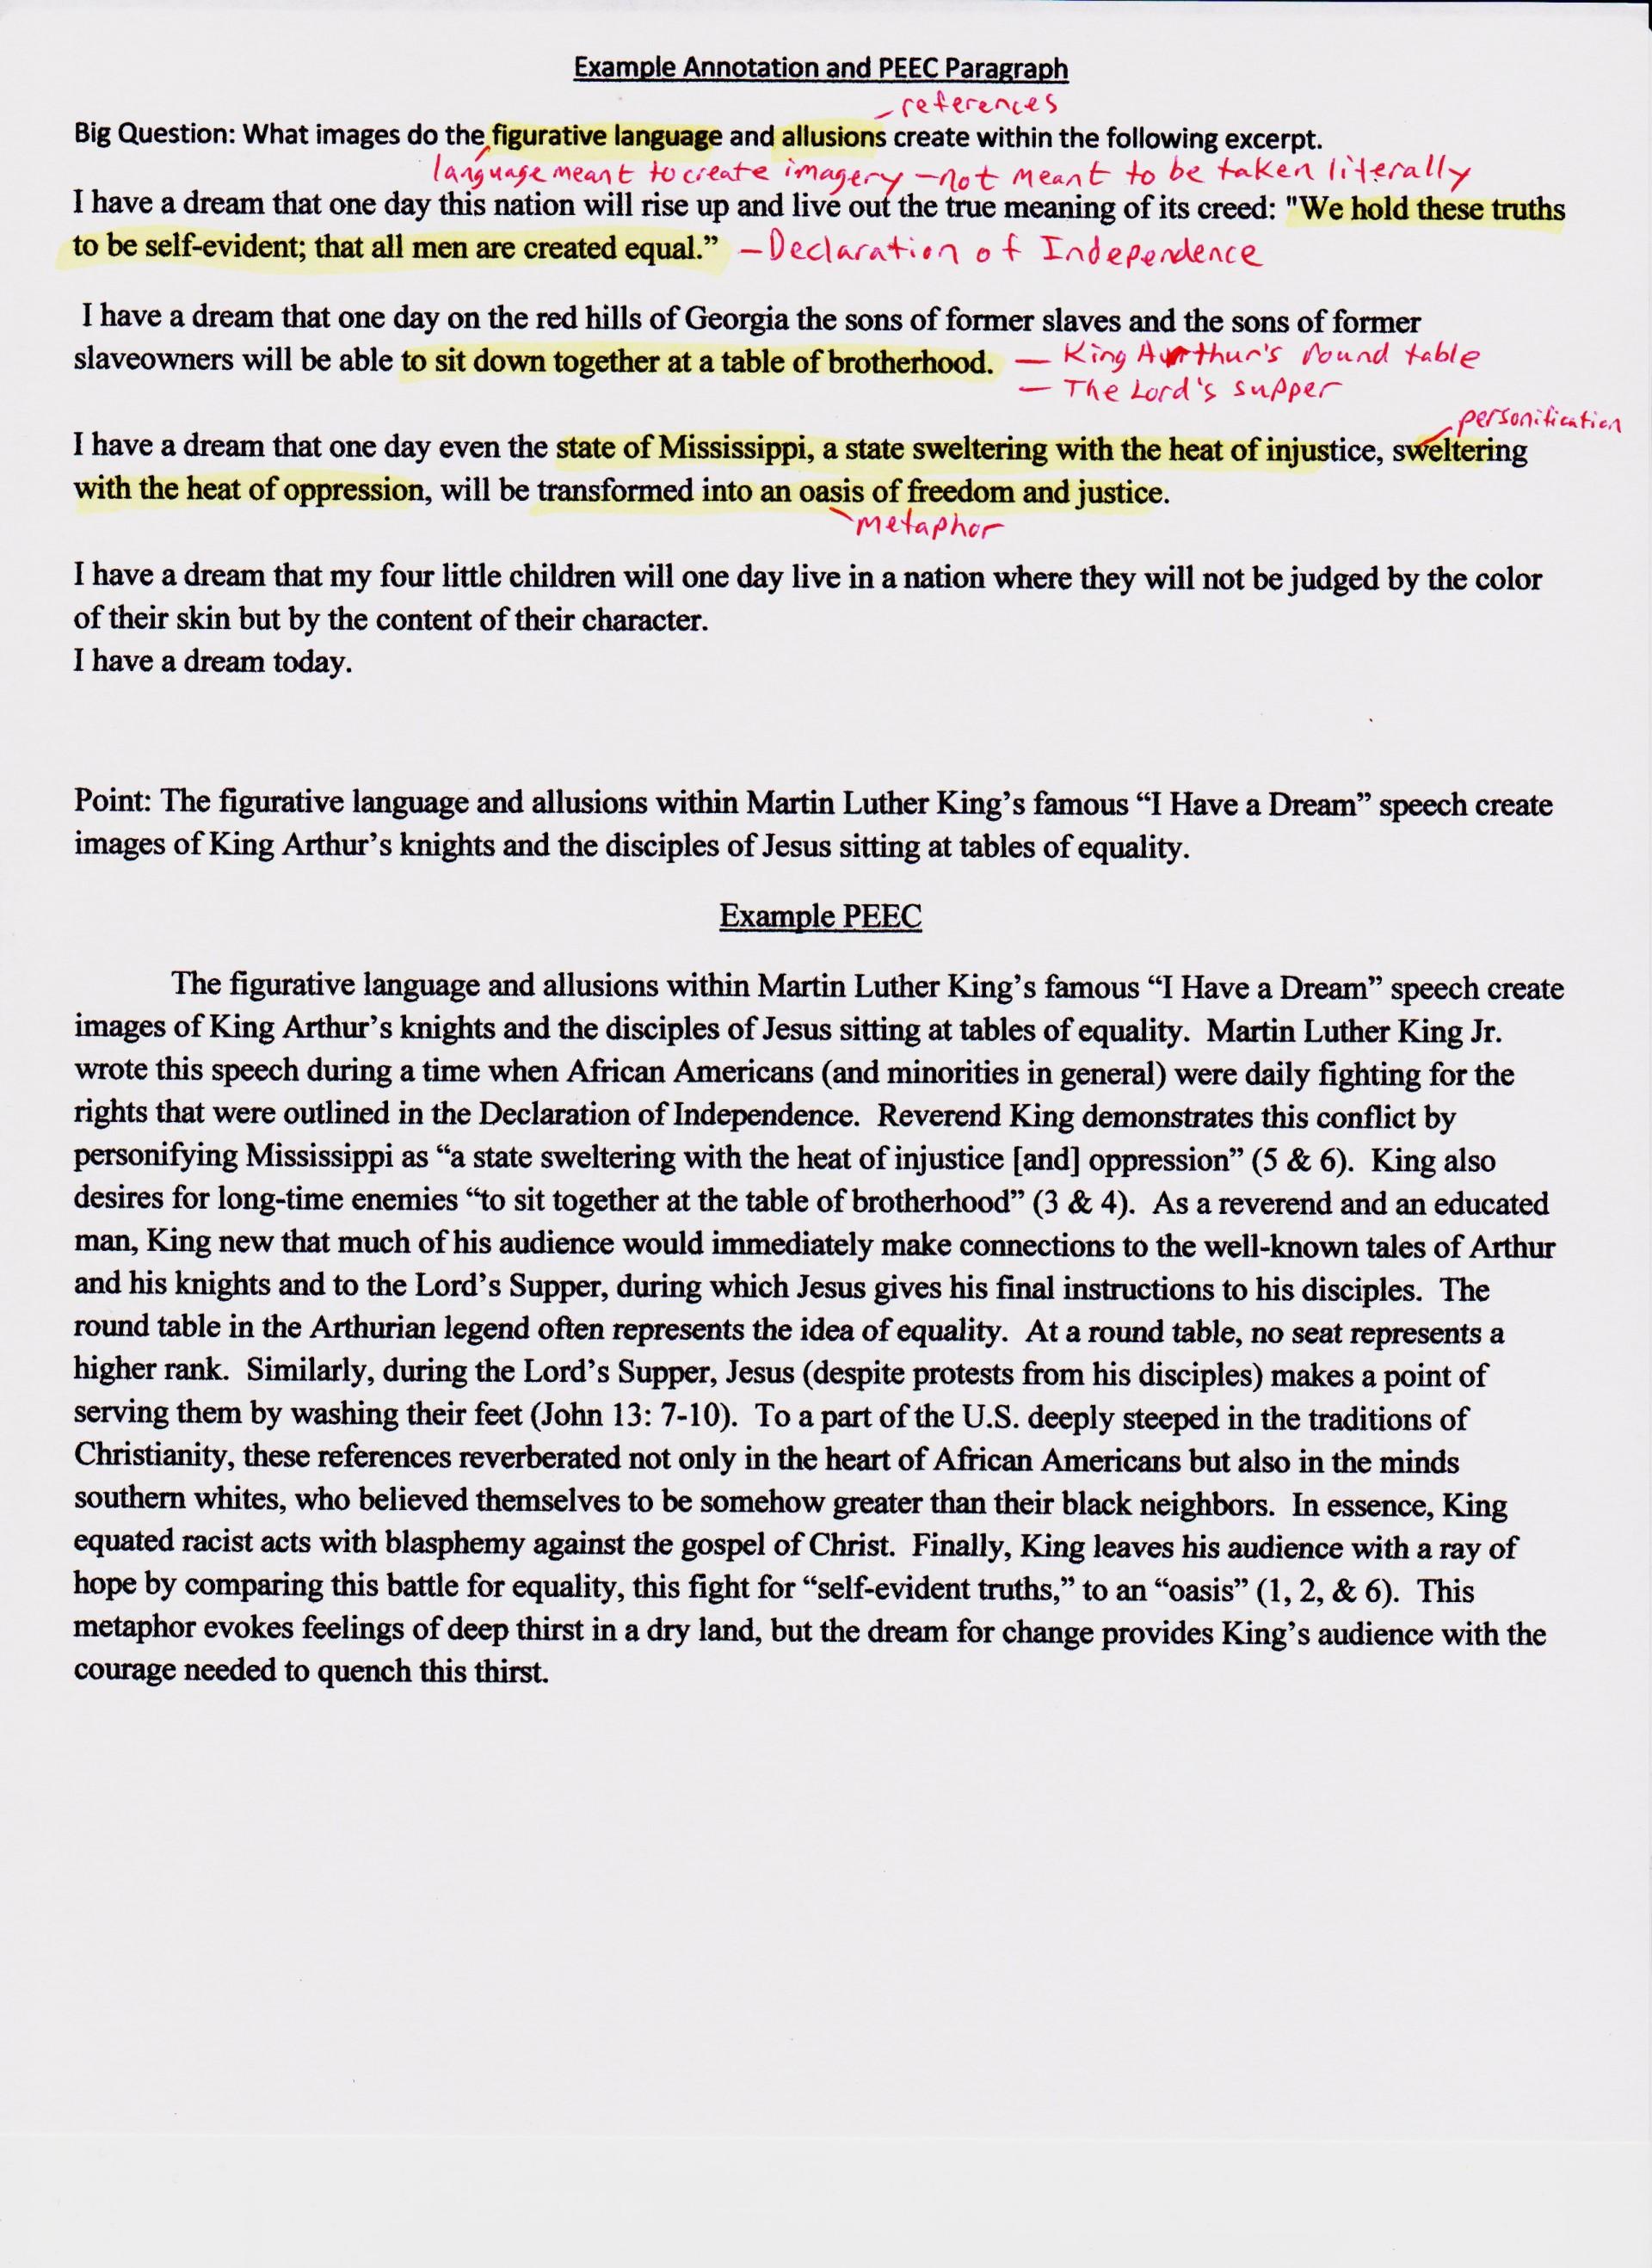 008 Example20annotation20and20plea20001 Essay Example Njhs Unique Conclusion 1920